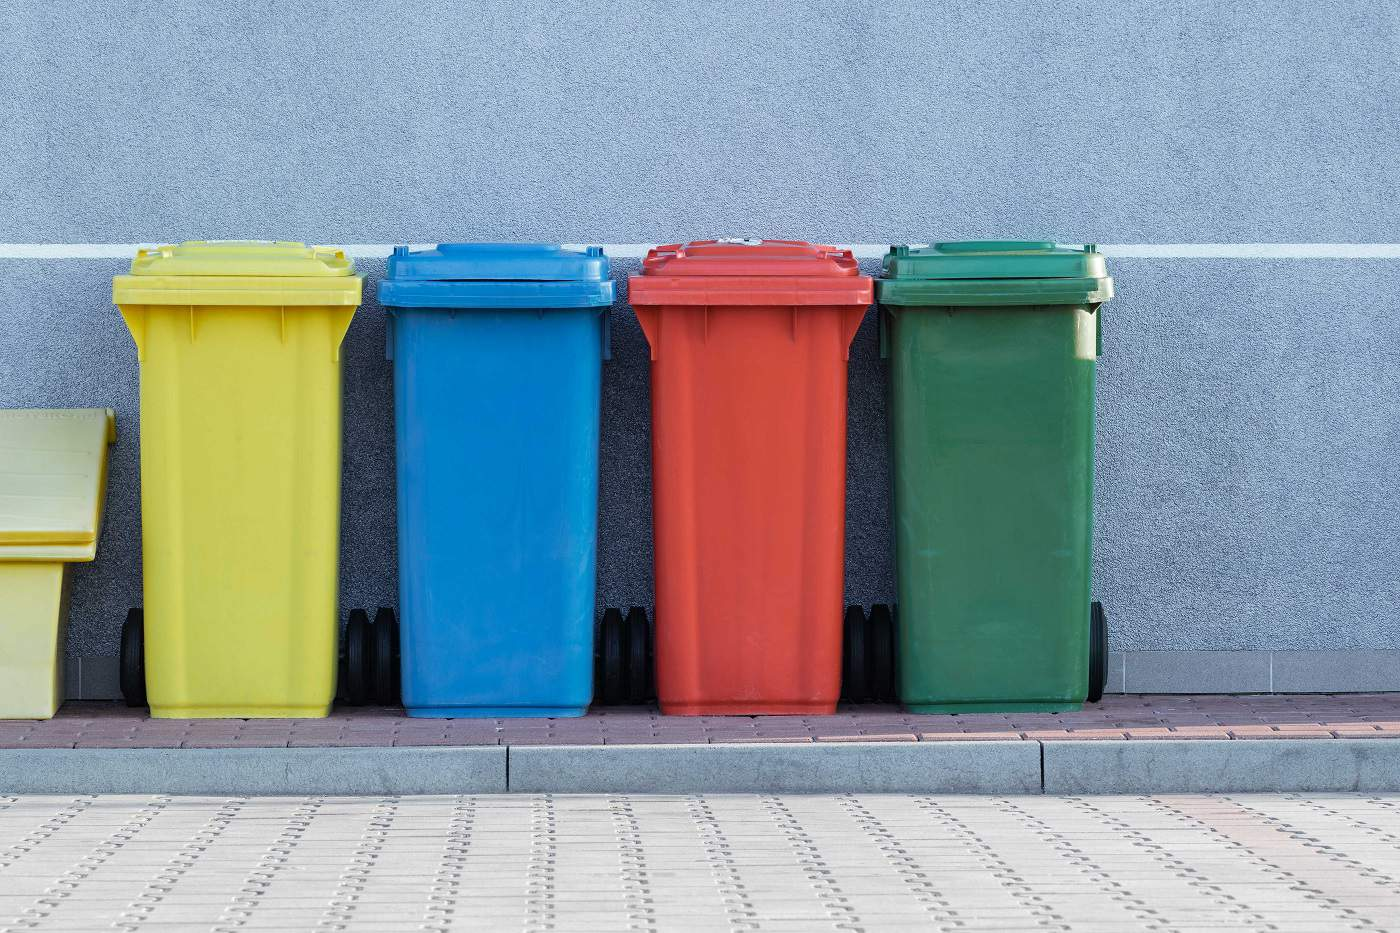 Different colored waste bins for different types of waste from Paweł Czerwiński via Unsplash